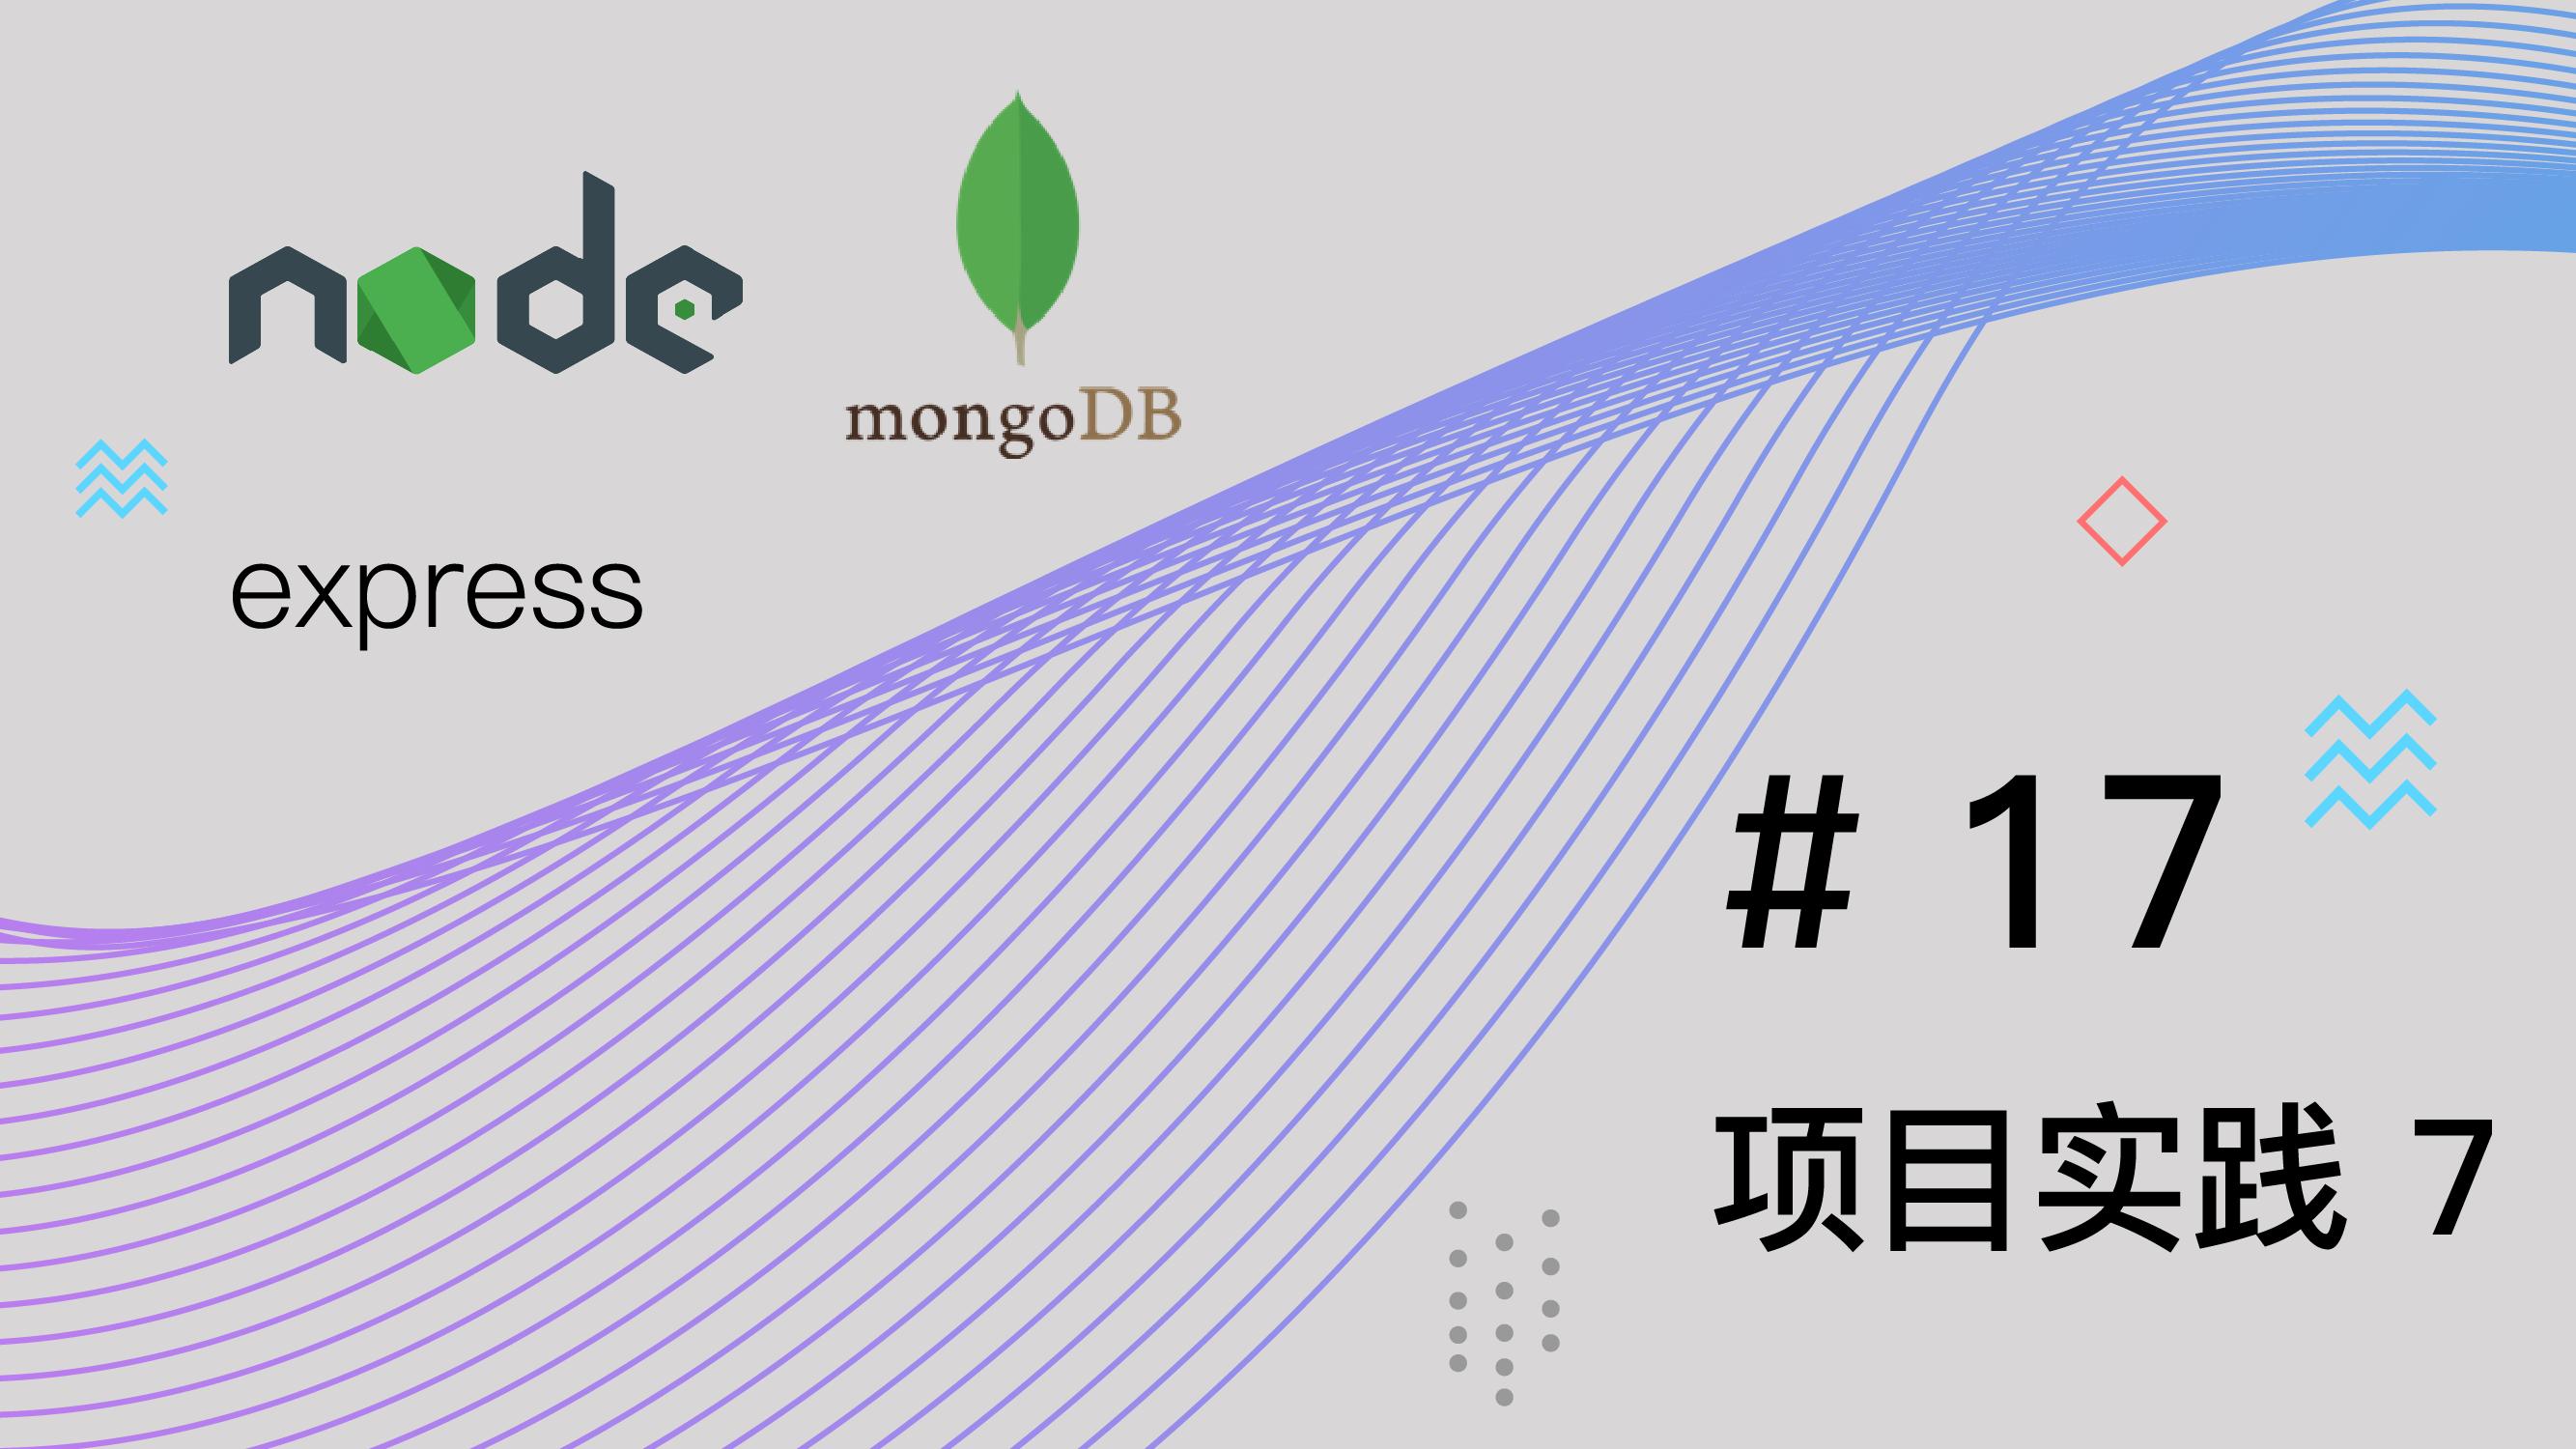 Node.js + Express + MongoDB 基础篇 #17 项目实践 part 7 完结